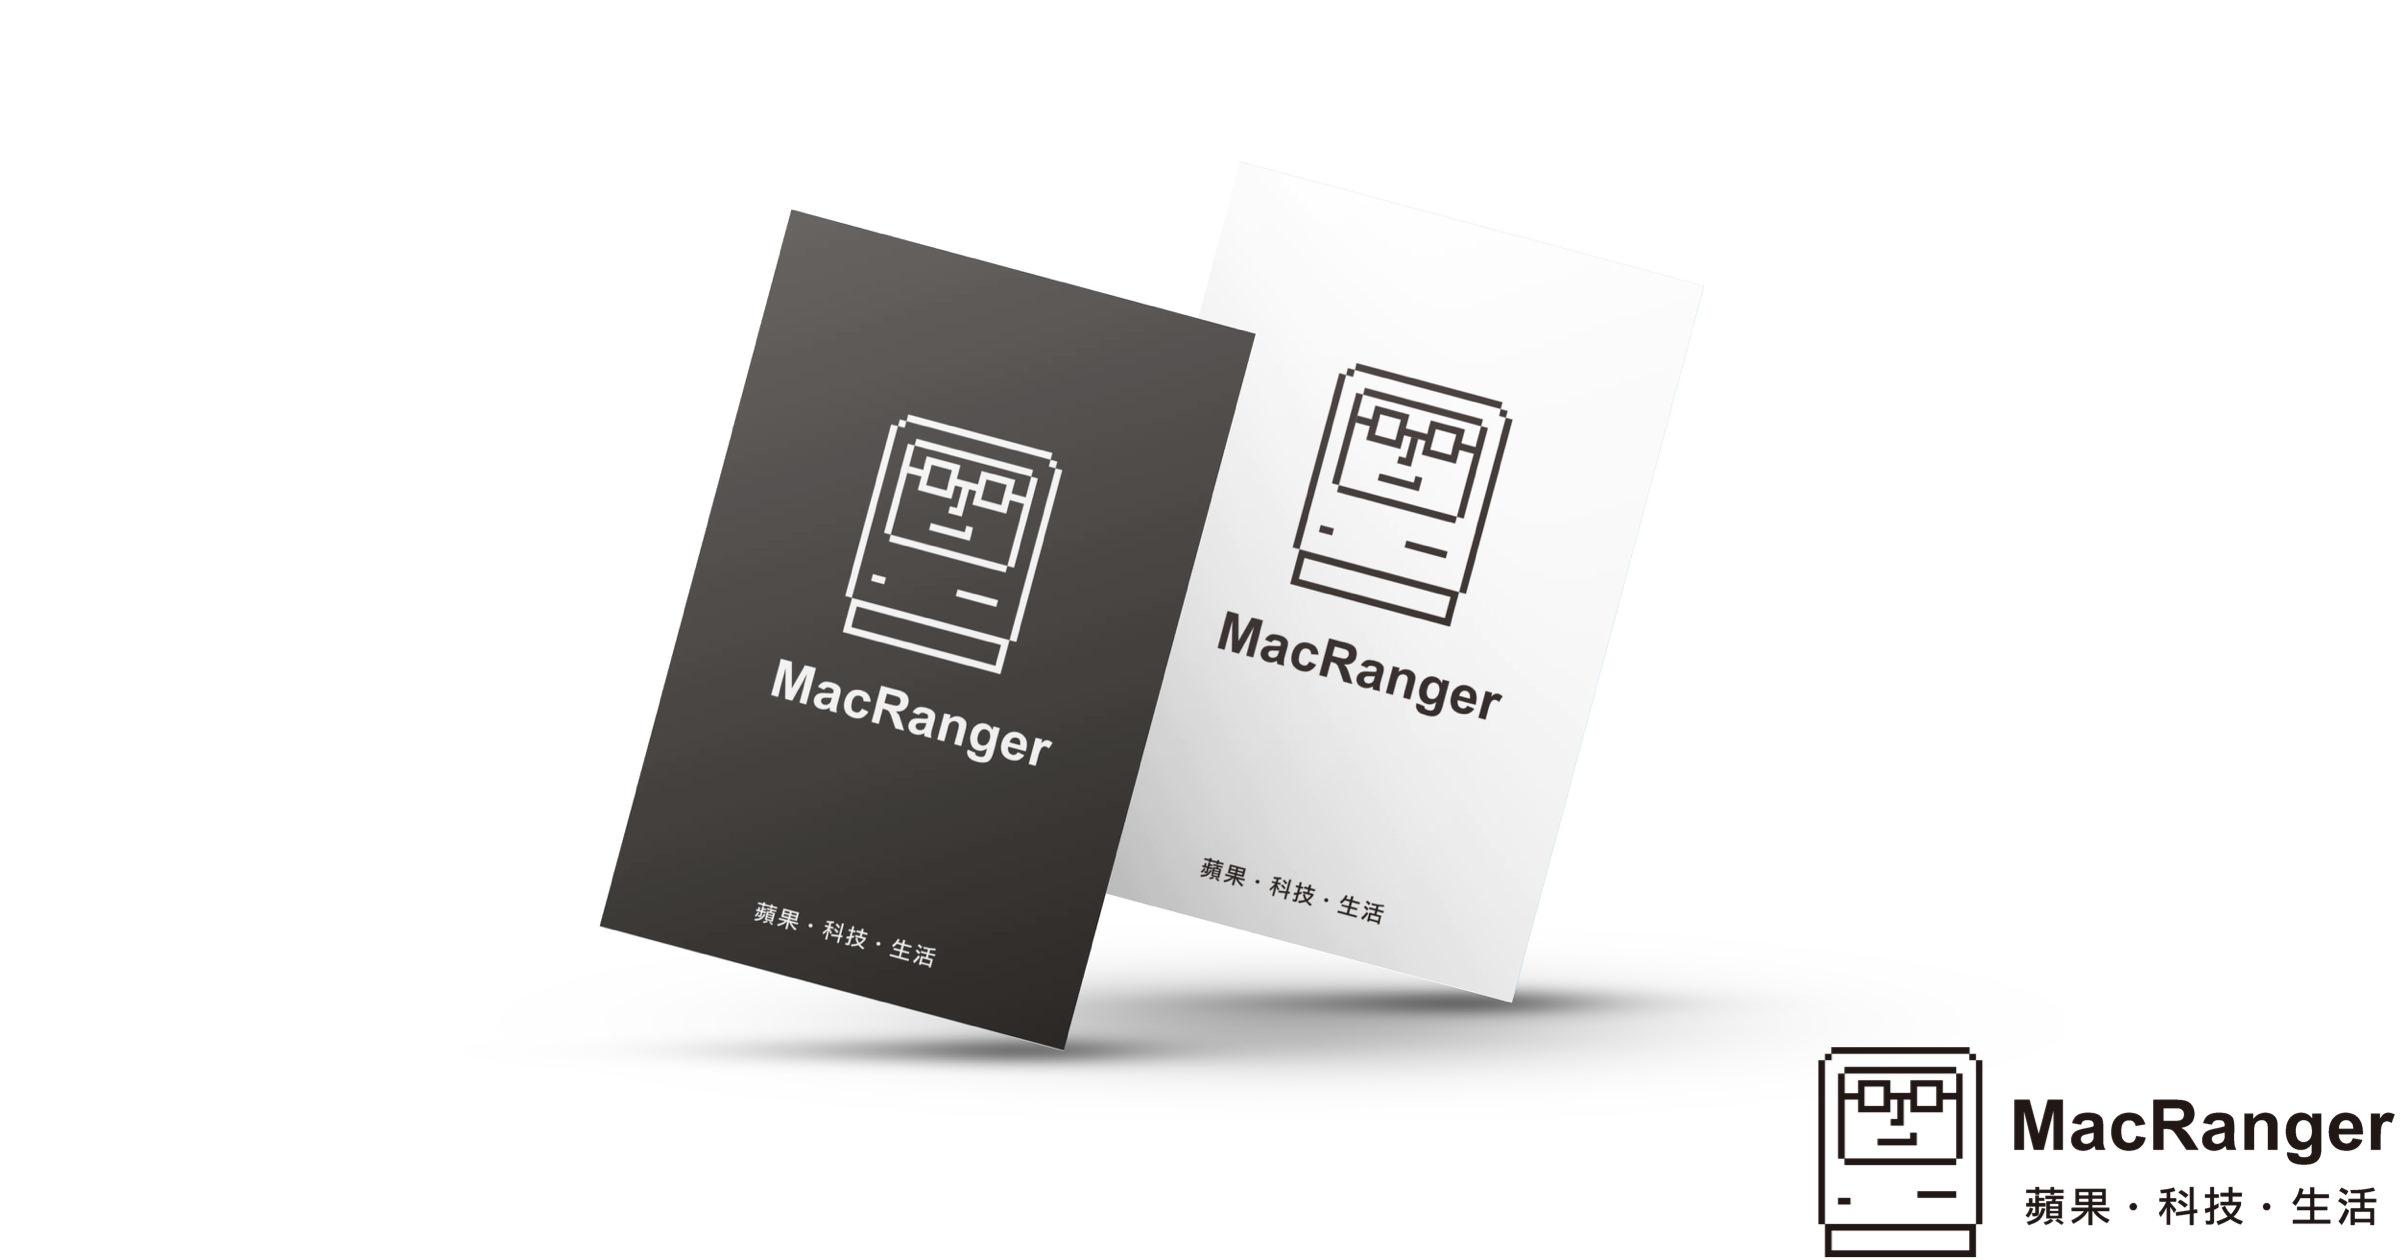 MacRanger